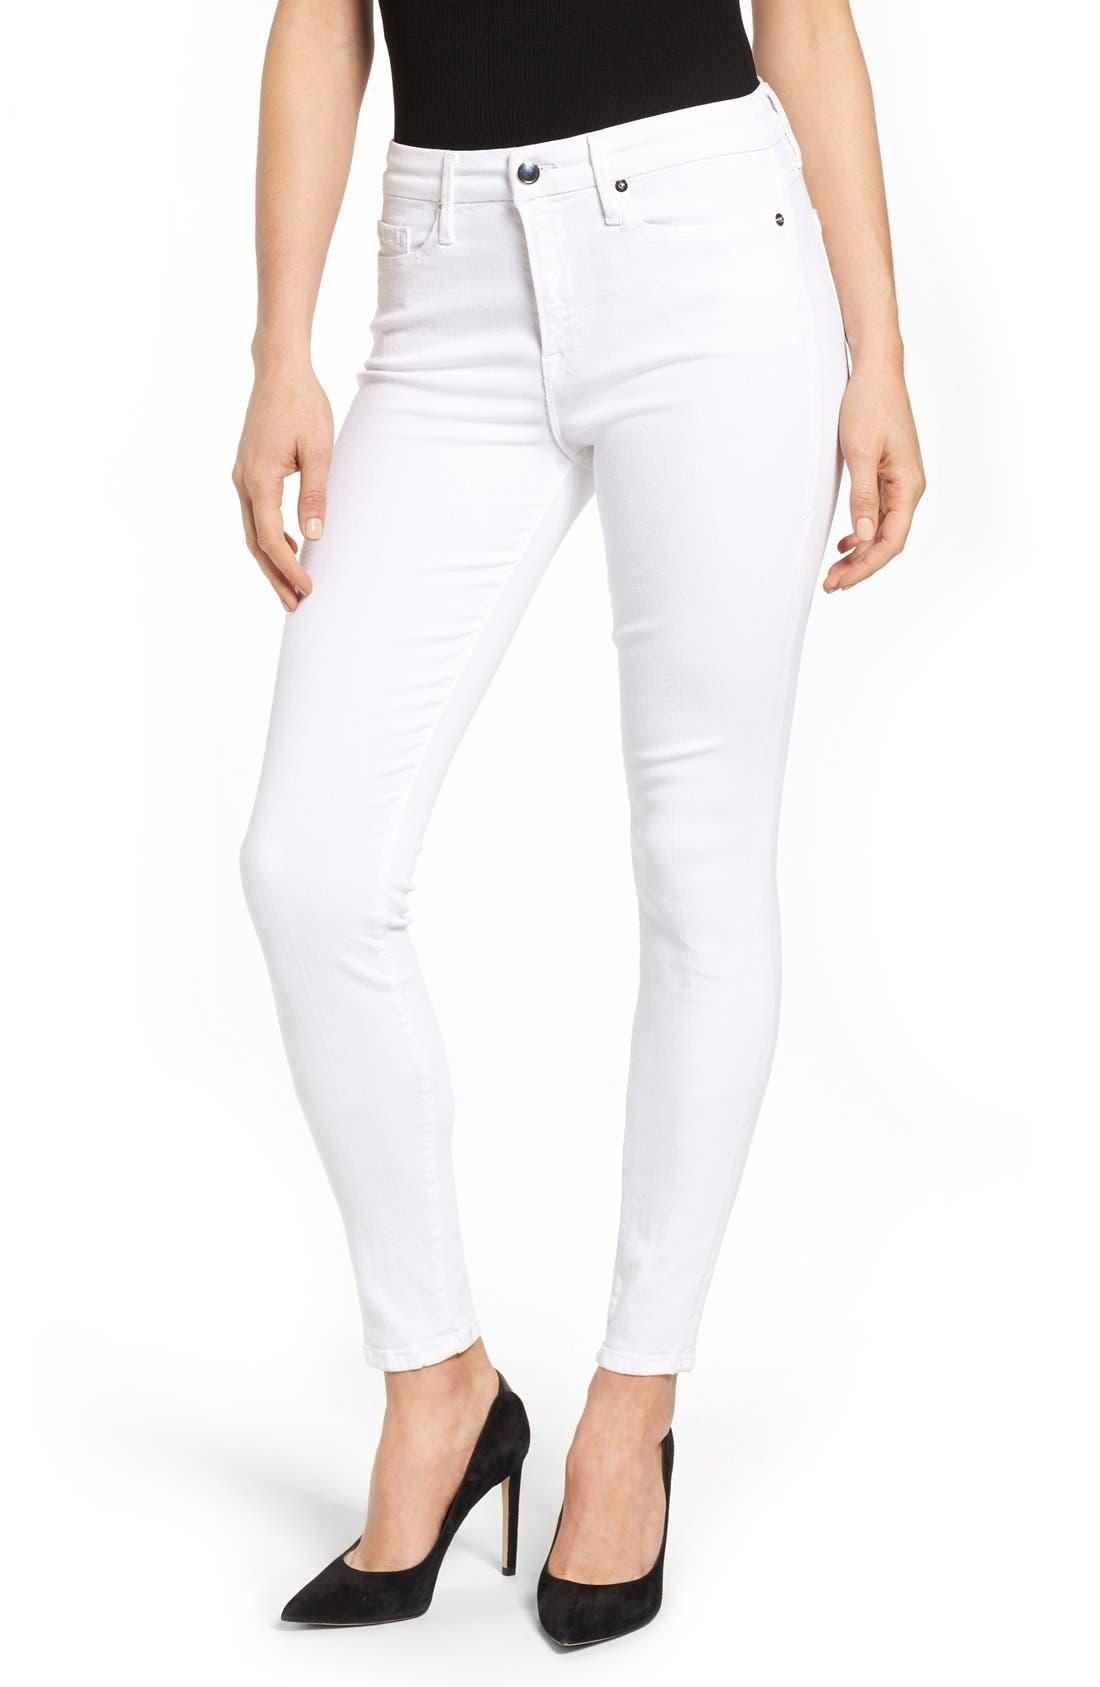 Main Image - Good American Good Legs High Rise Skinny Jeans